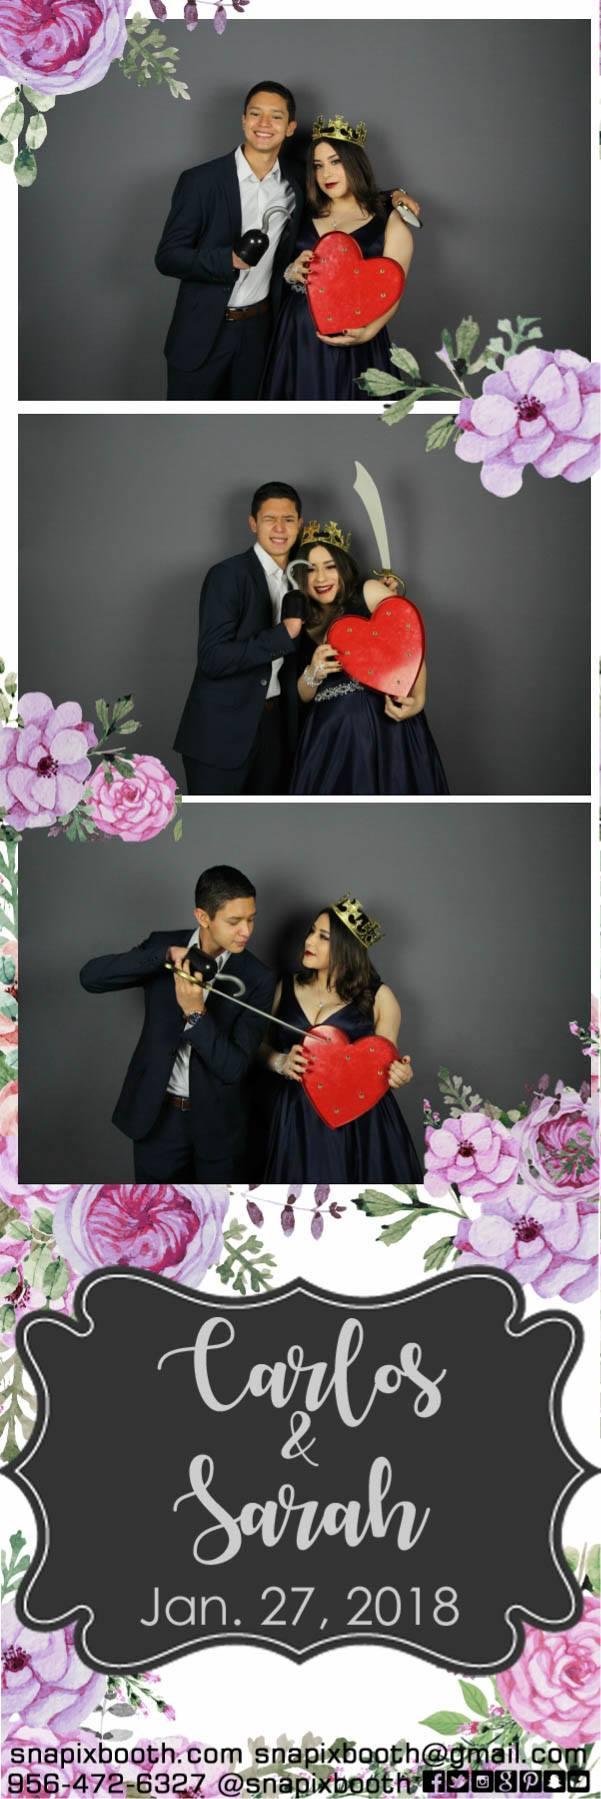 Carlos & Sarah Wedding 1.27